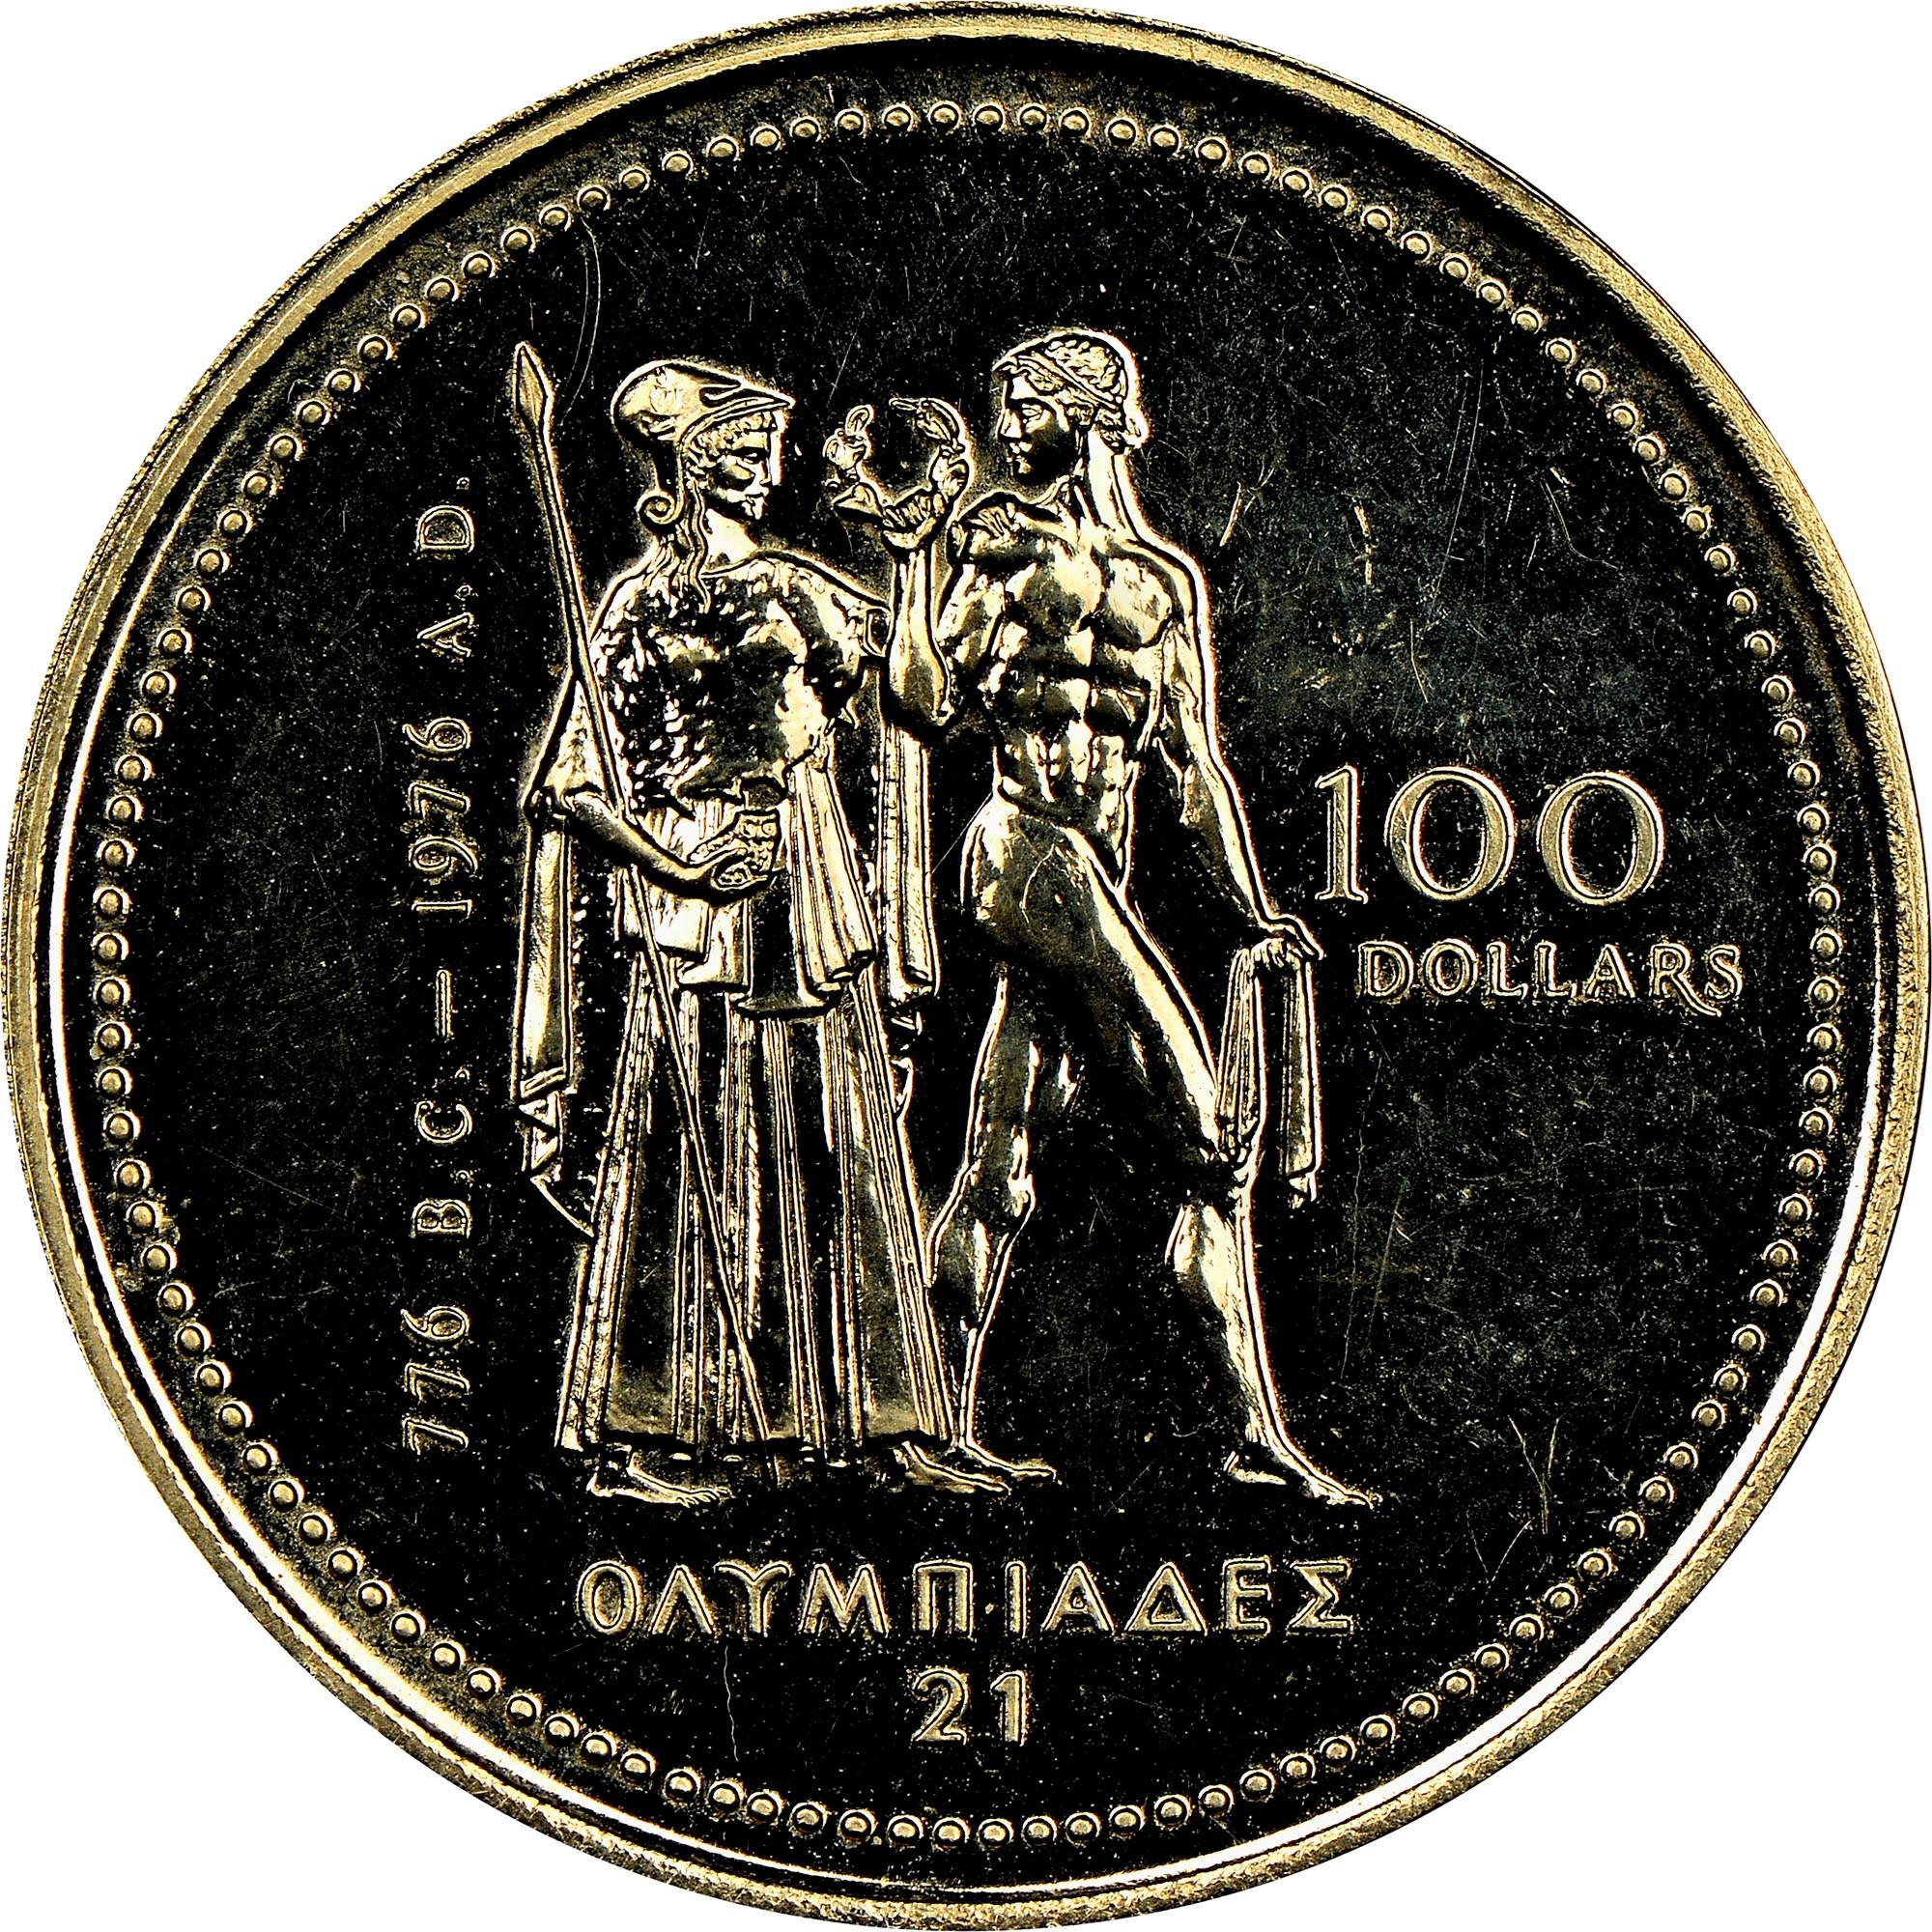 Canada 100 Dollars reverse